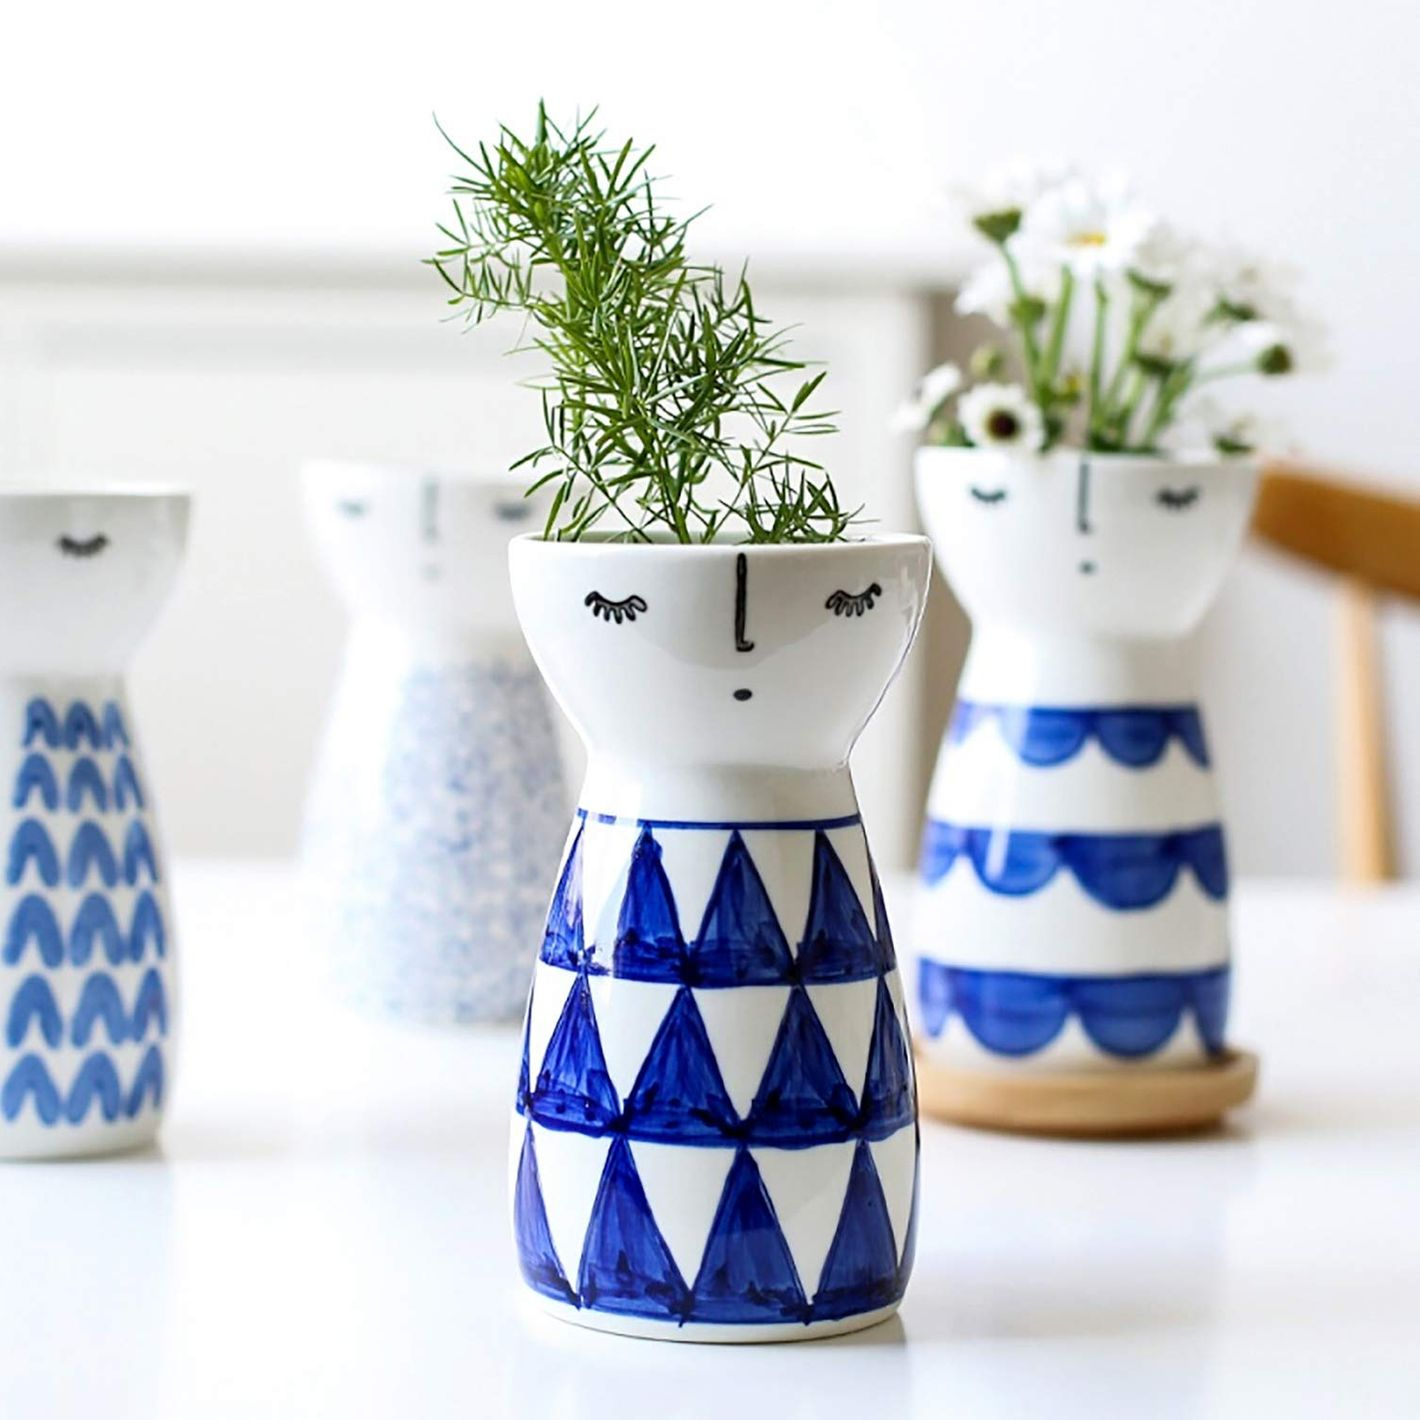 Senliart White Ceramic Vase